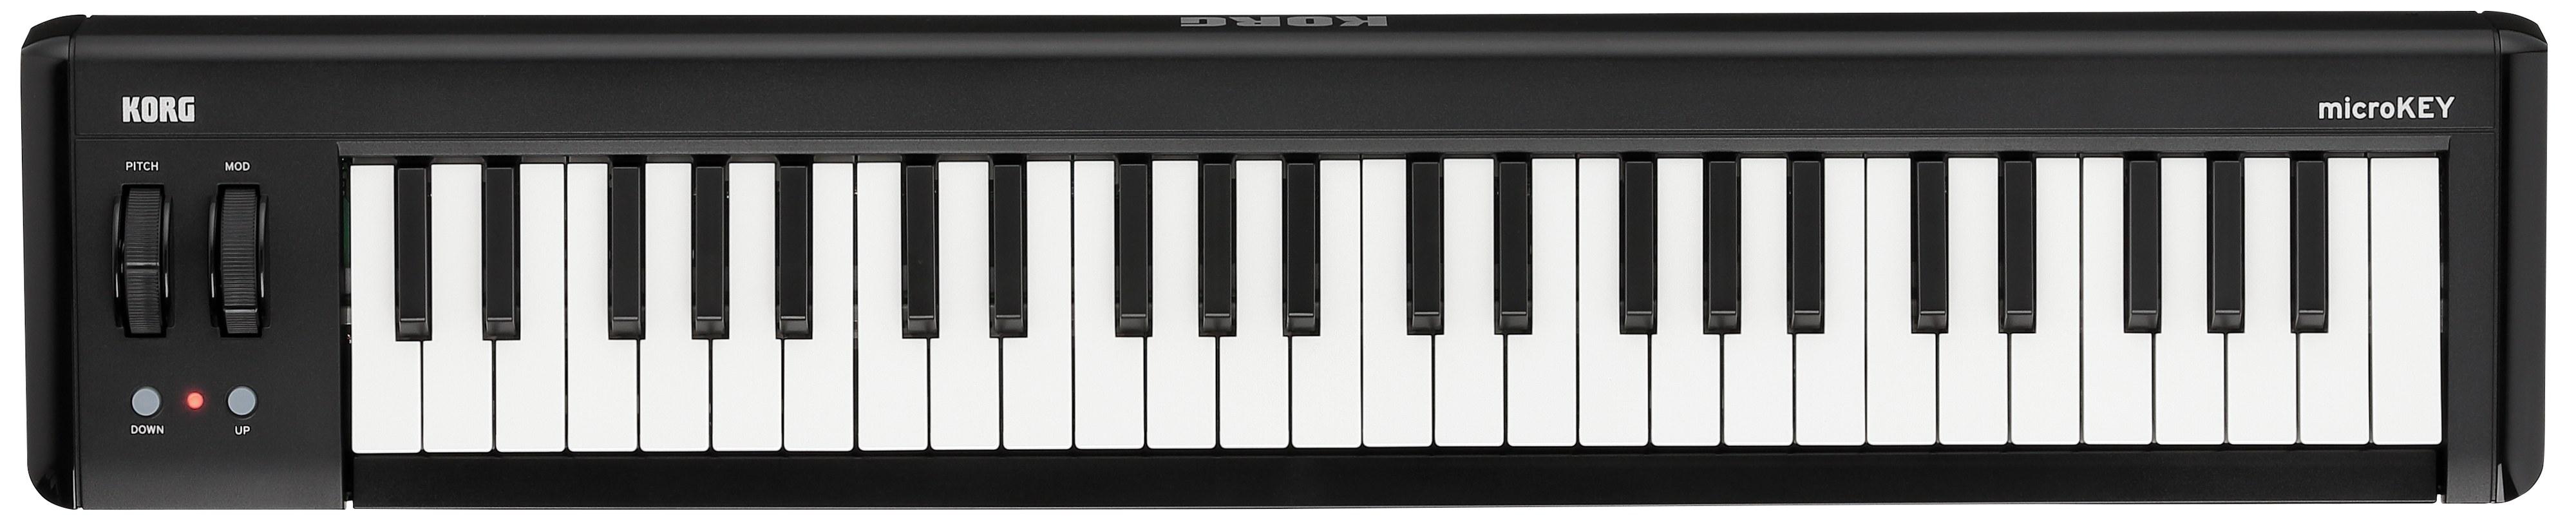 KORG microKEY2 49 USB Controller Keyboard